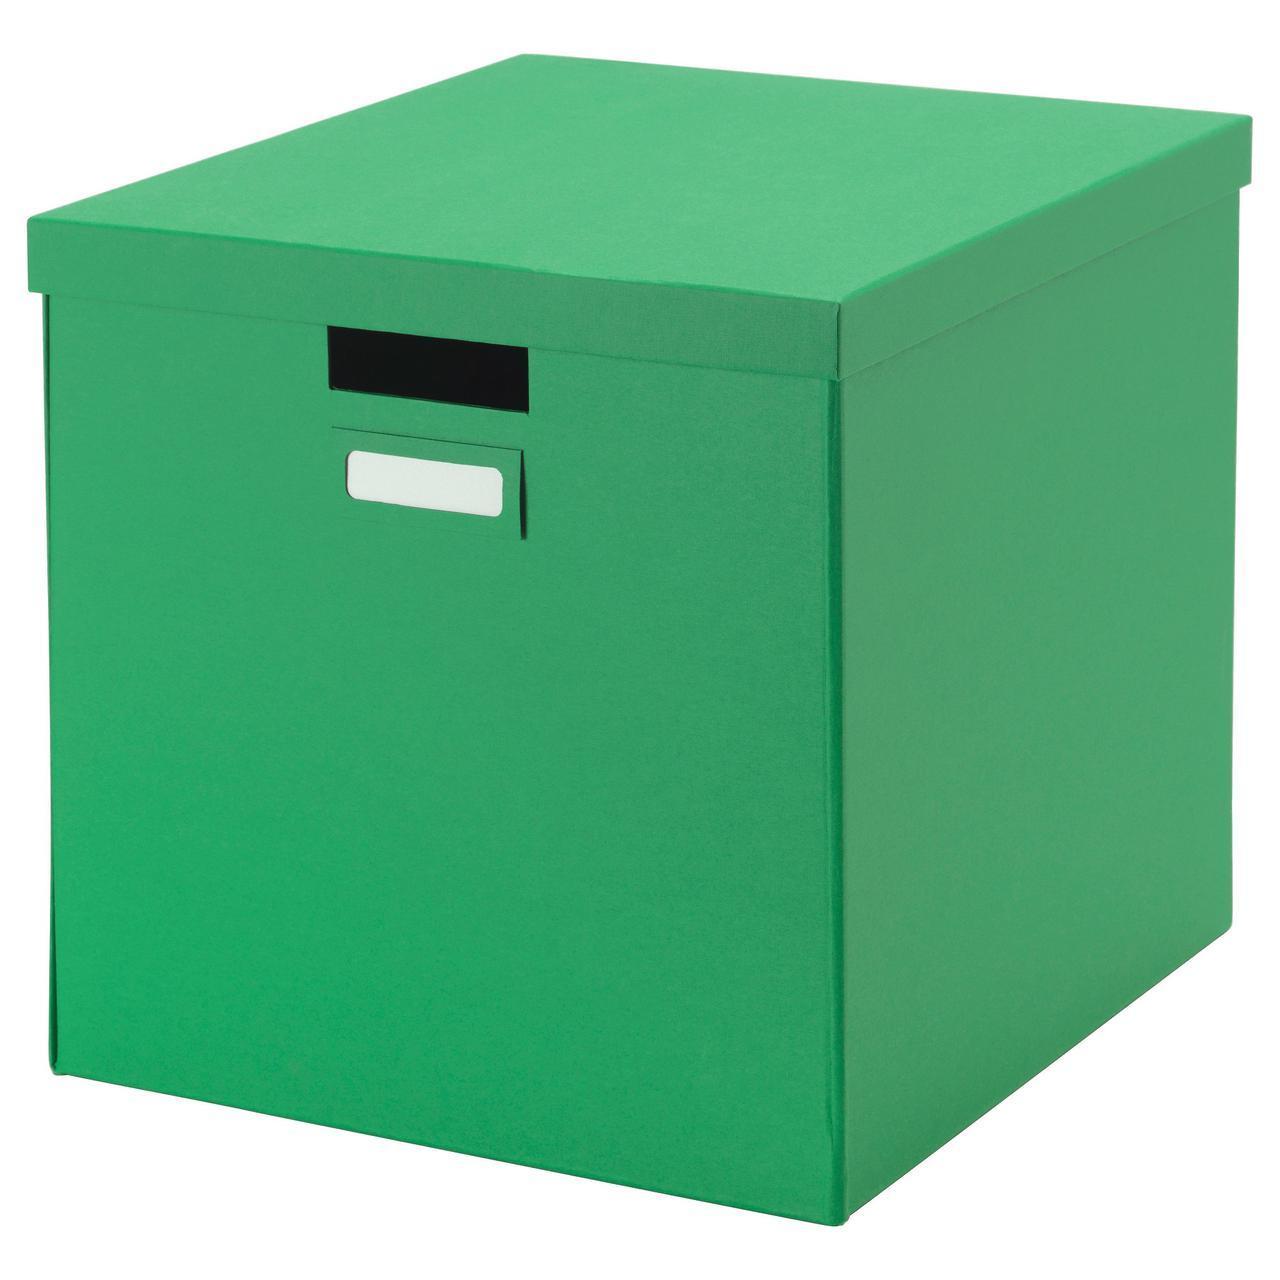 IKEA TJENA (802.919.91) Коробка с крышкой, зеленая